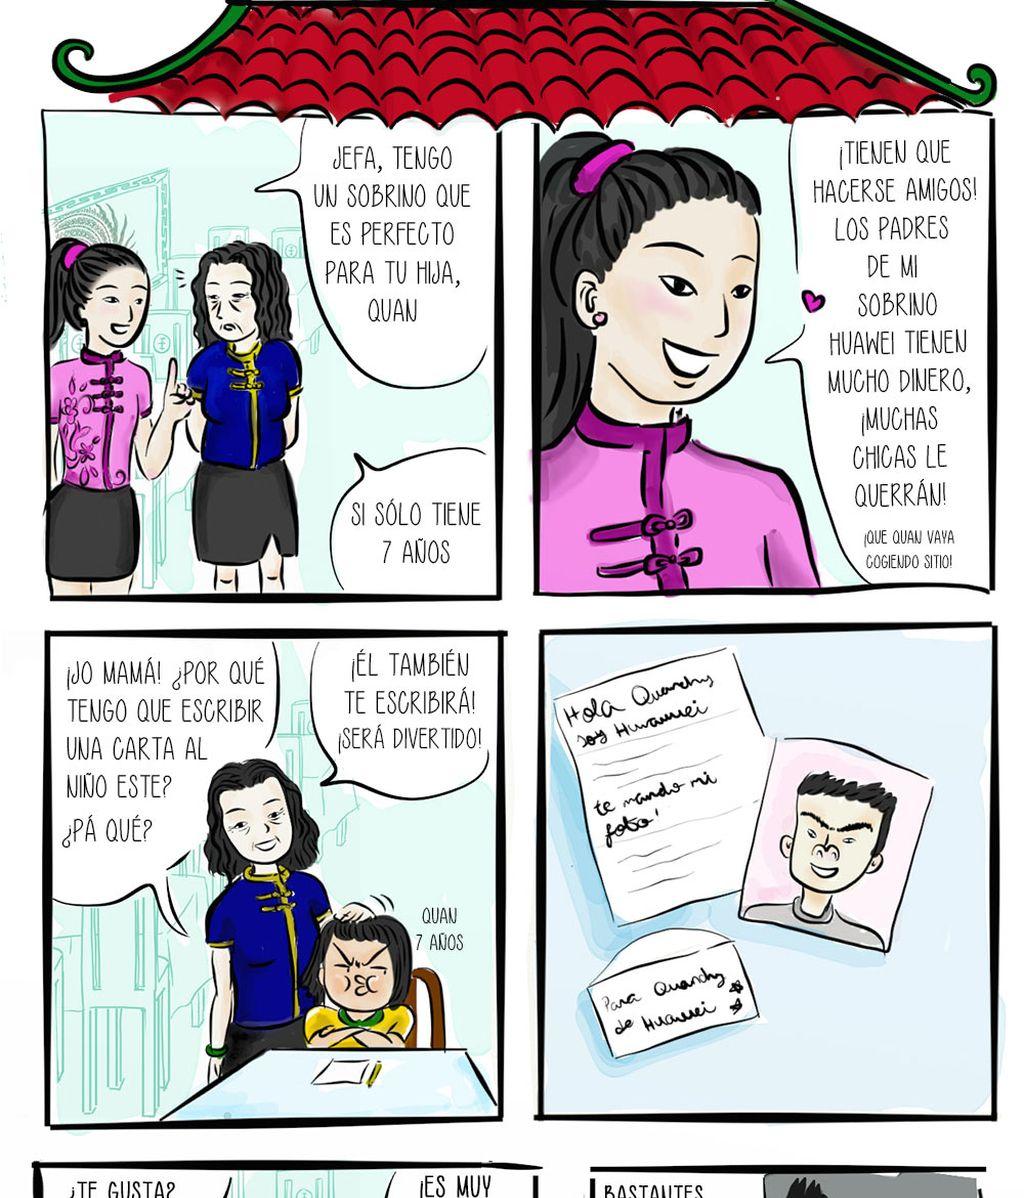 4. Historias del restaurante chino